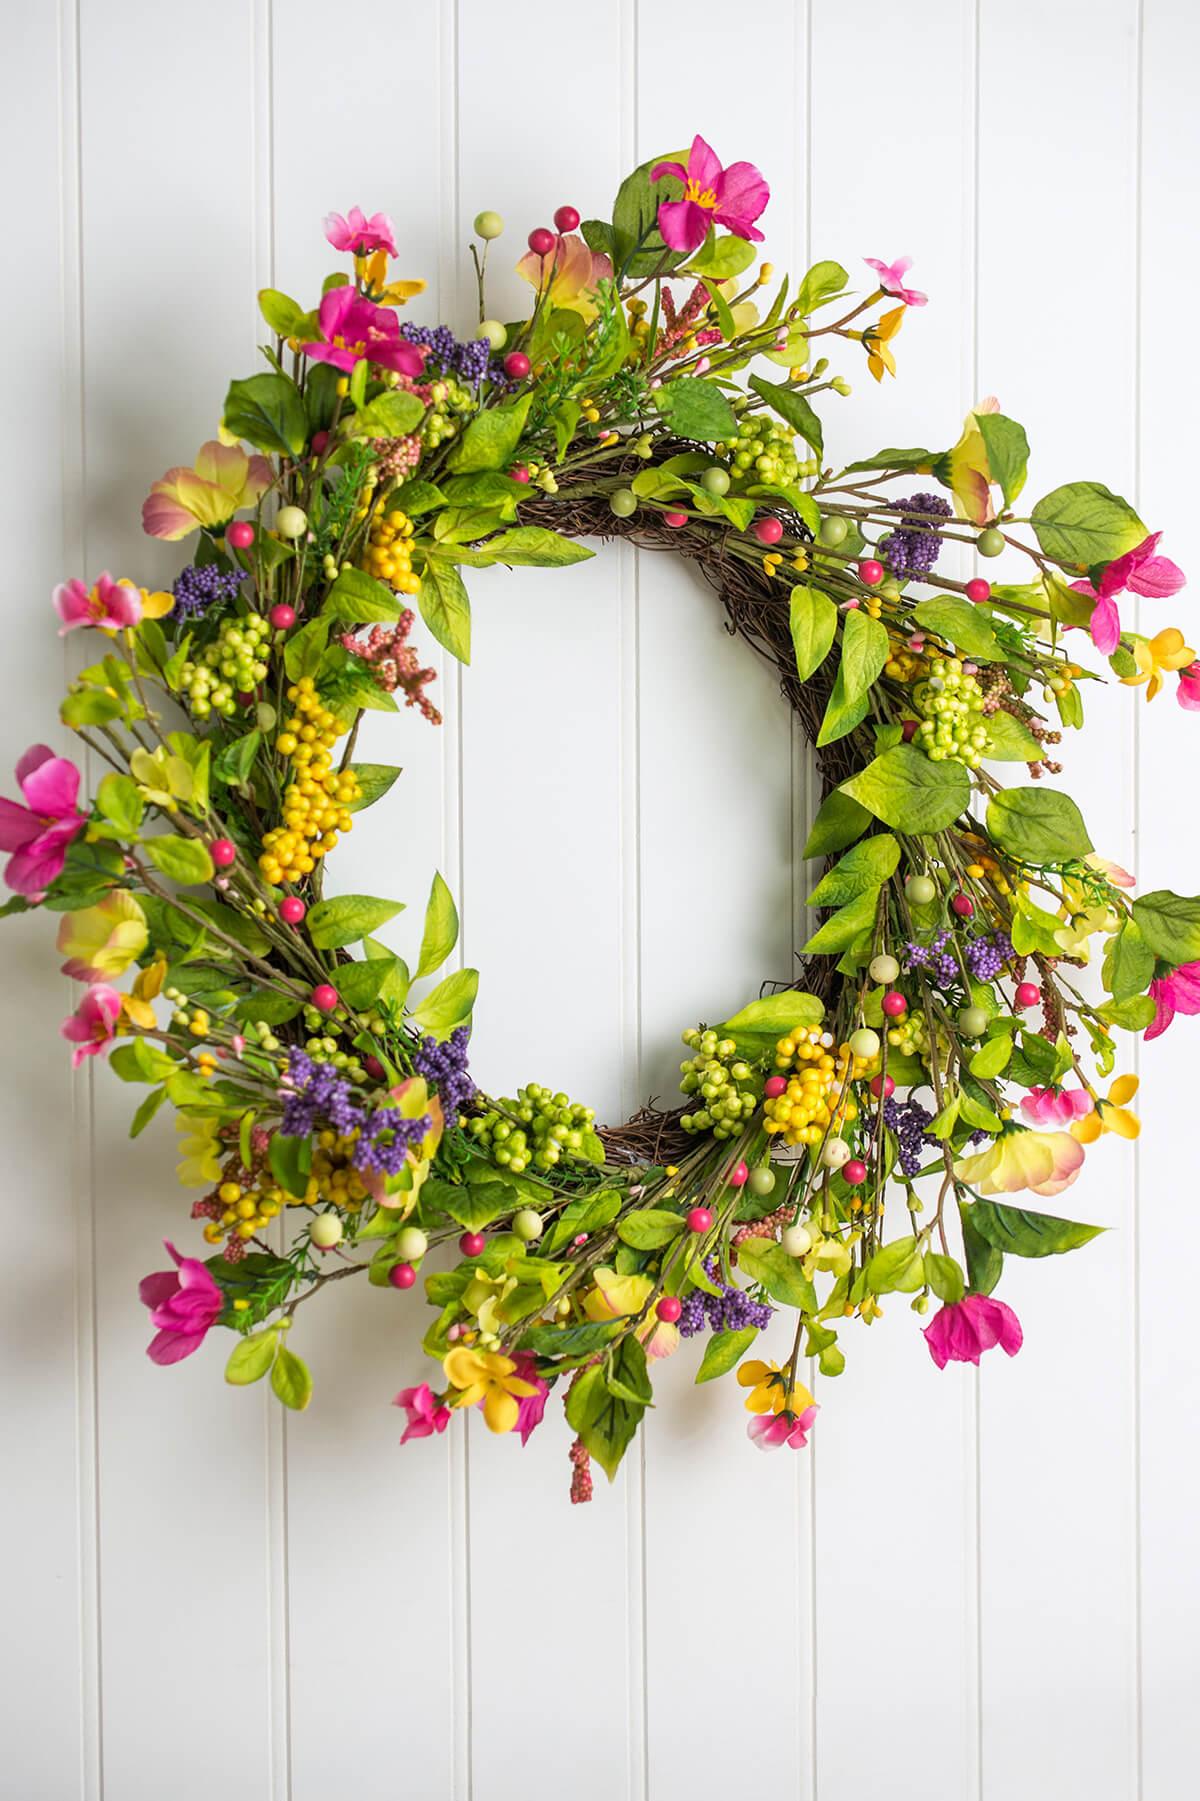 Spring Wildflower Wreath 20in